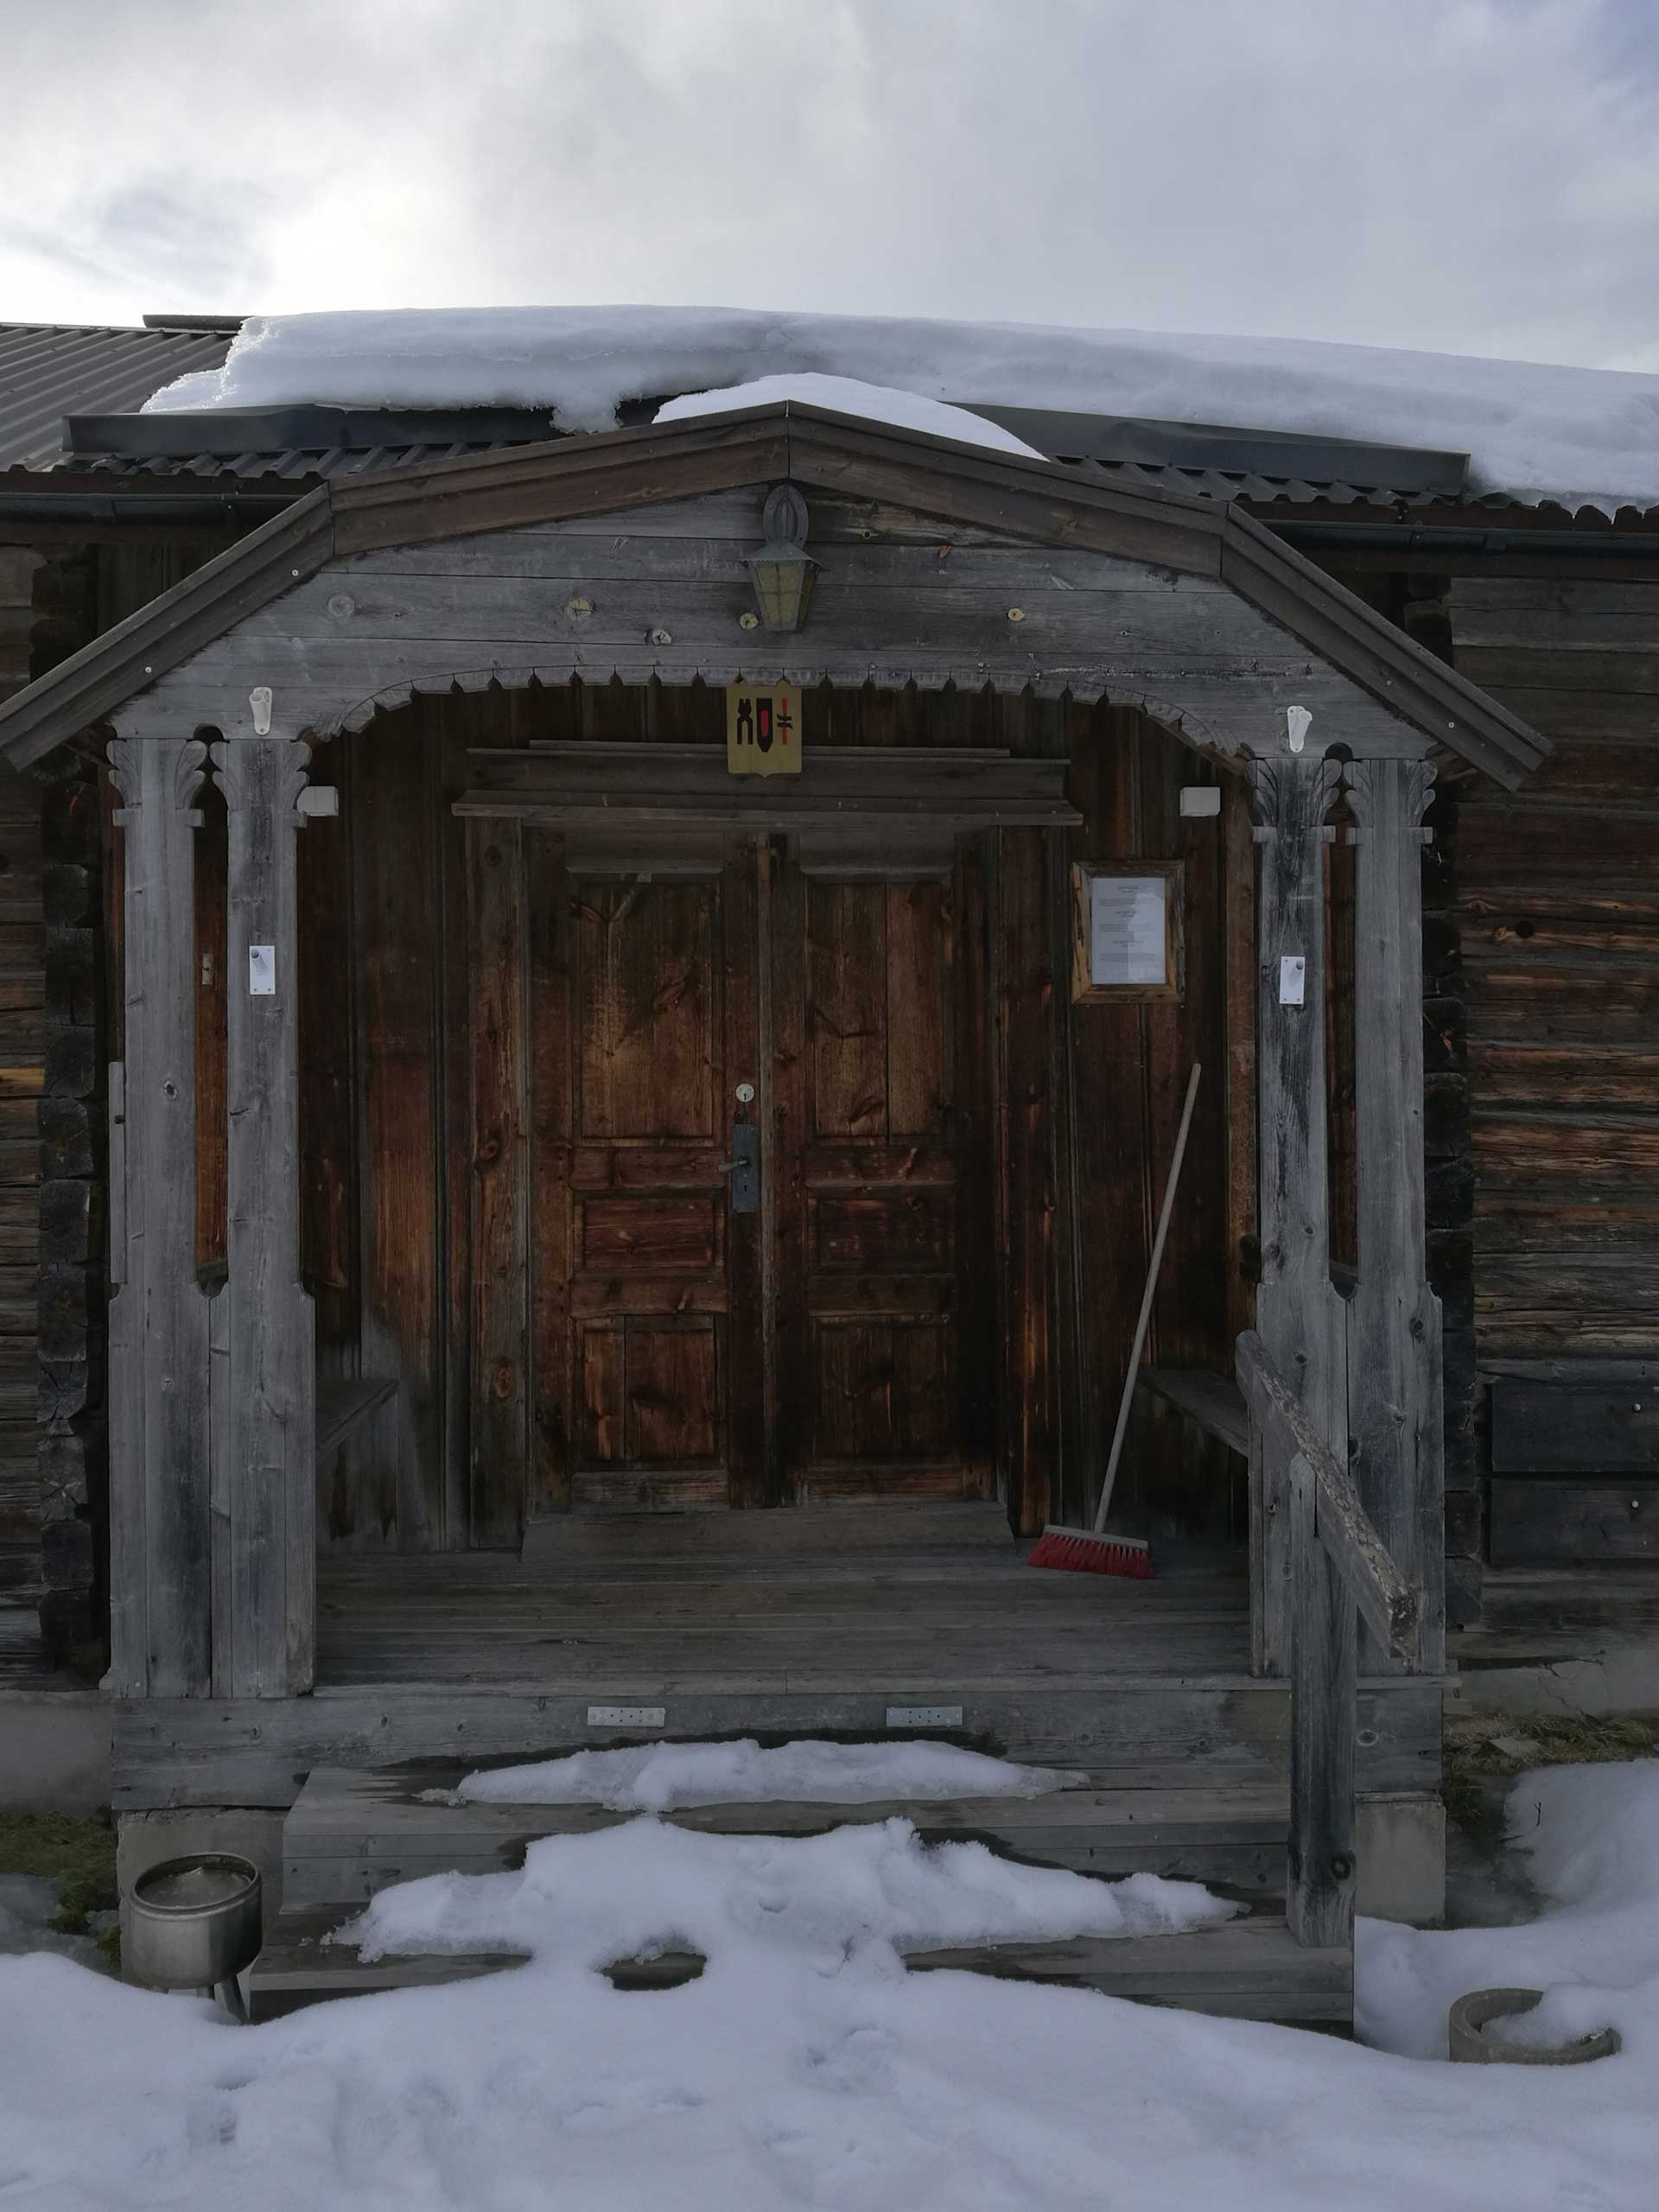 Hede Hembygdsgård photo: Barbro Nässelqvist